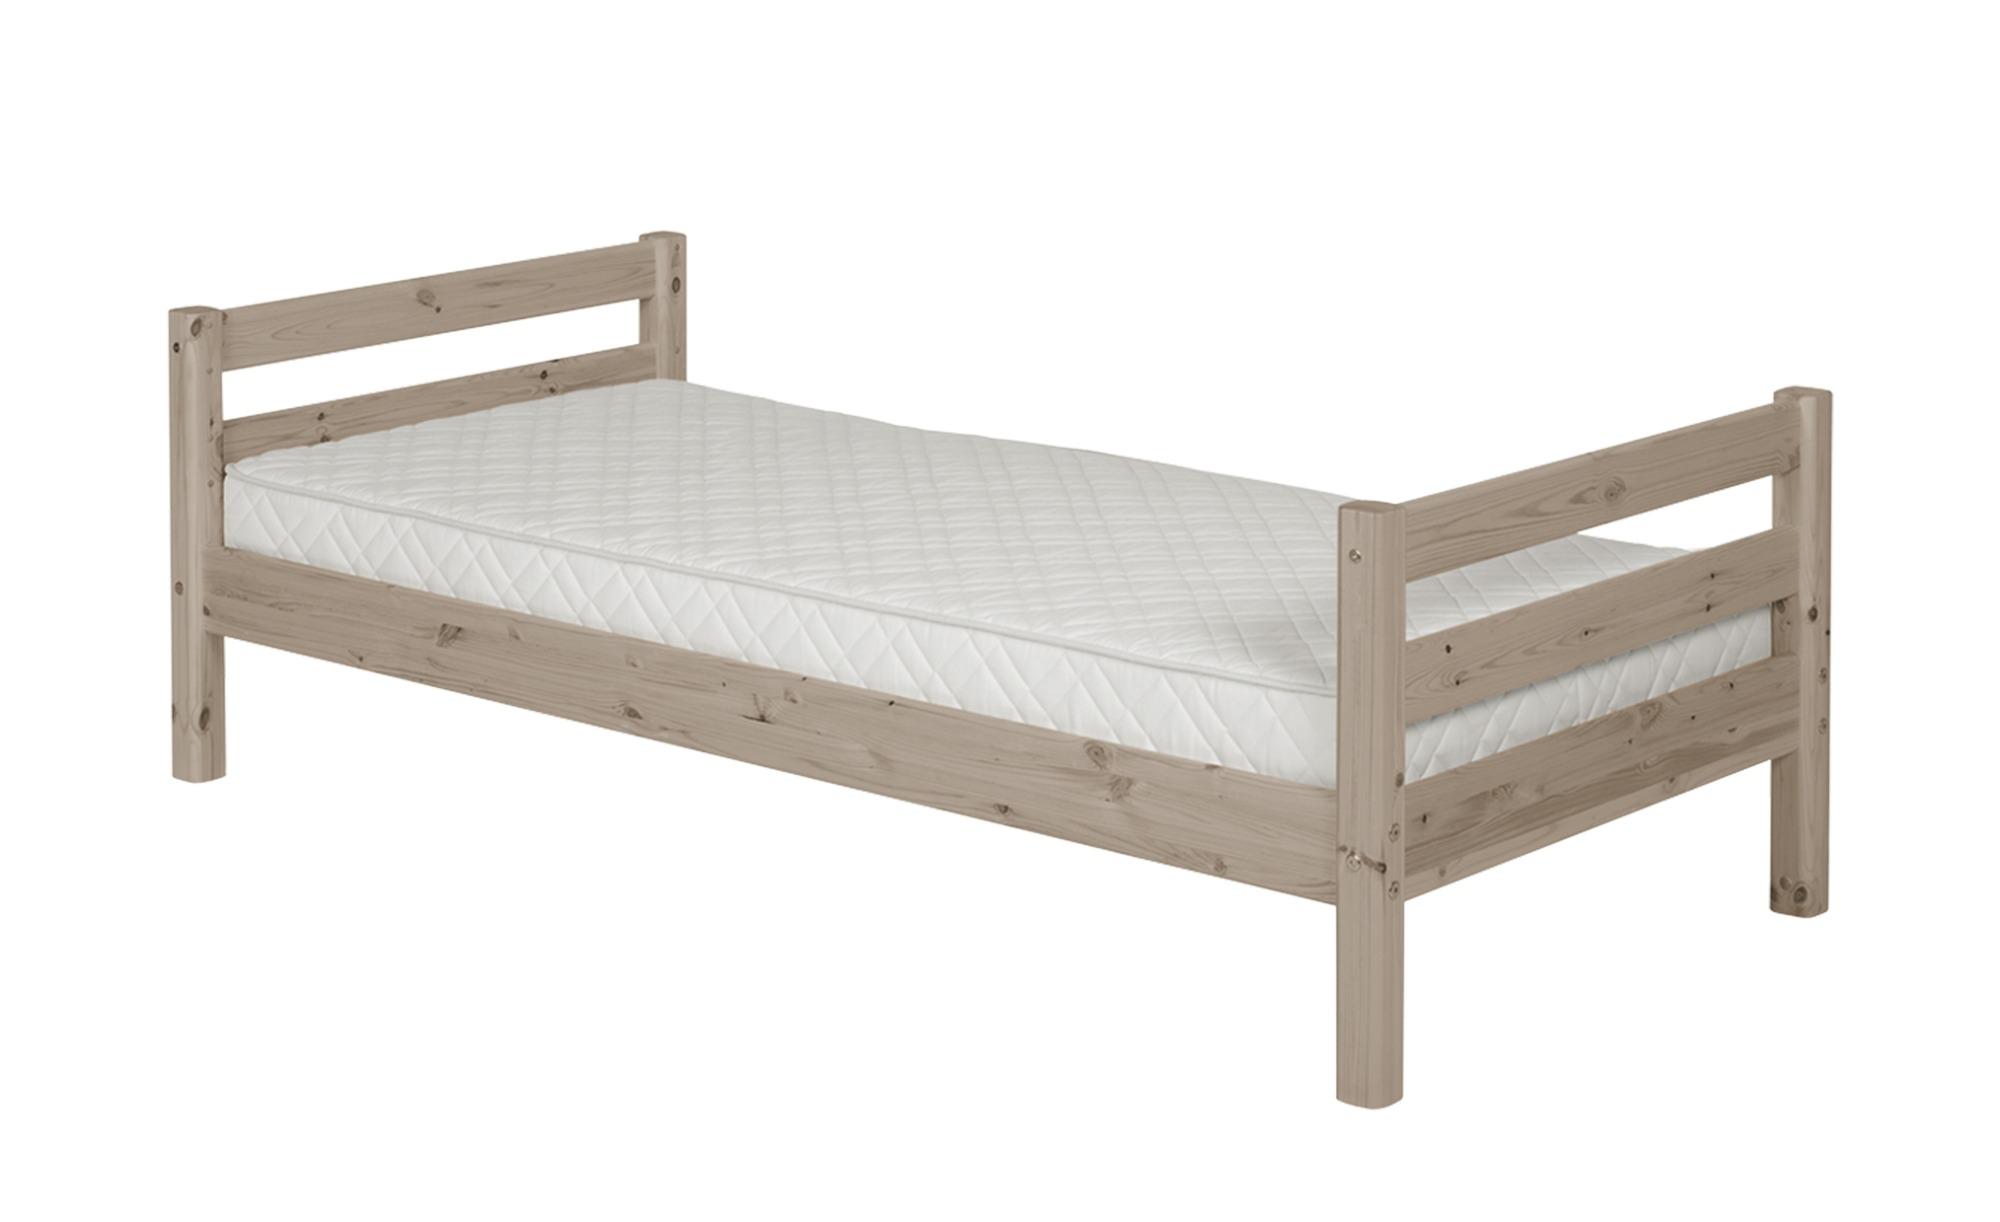 Full Size of Flexa Bett 100x200 Terra Kiefer Classic Luxus Betten Günstig Kaufen Meise Ikea 160x200 Runde Ottoversand Düsseldorf Weiß überlänge Designer Bonprix Bett Betten 100x200